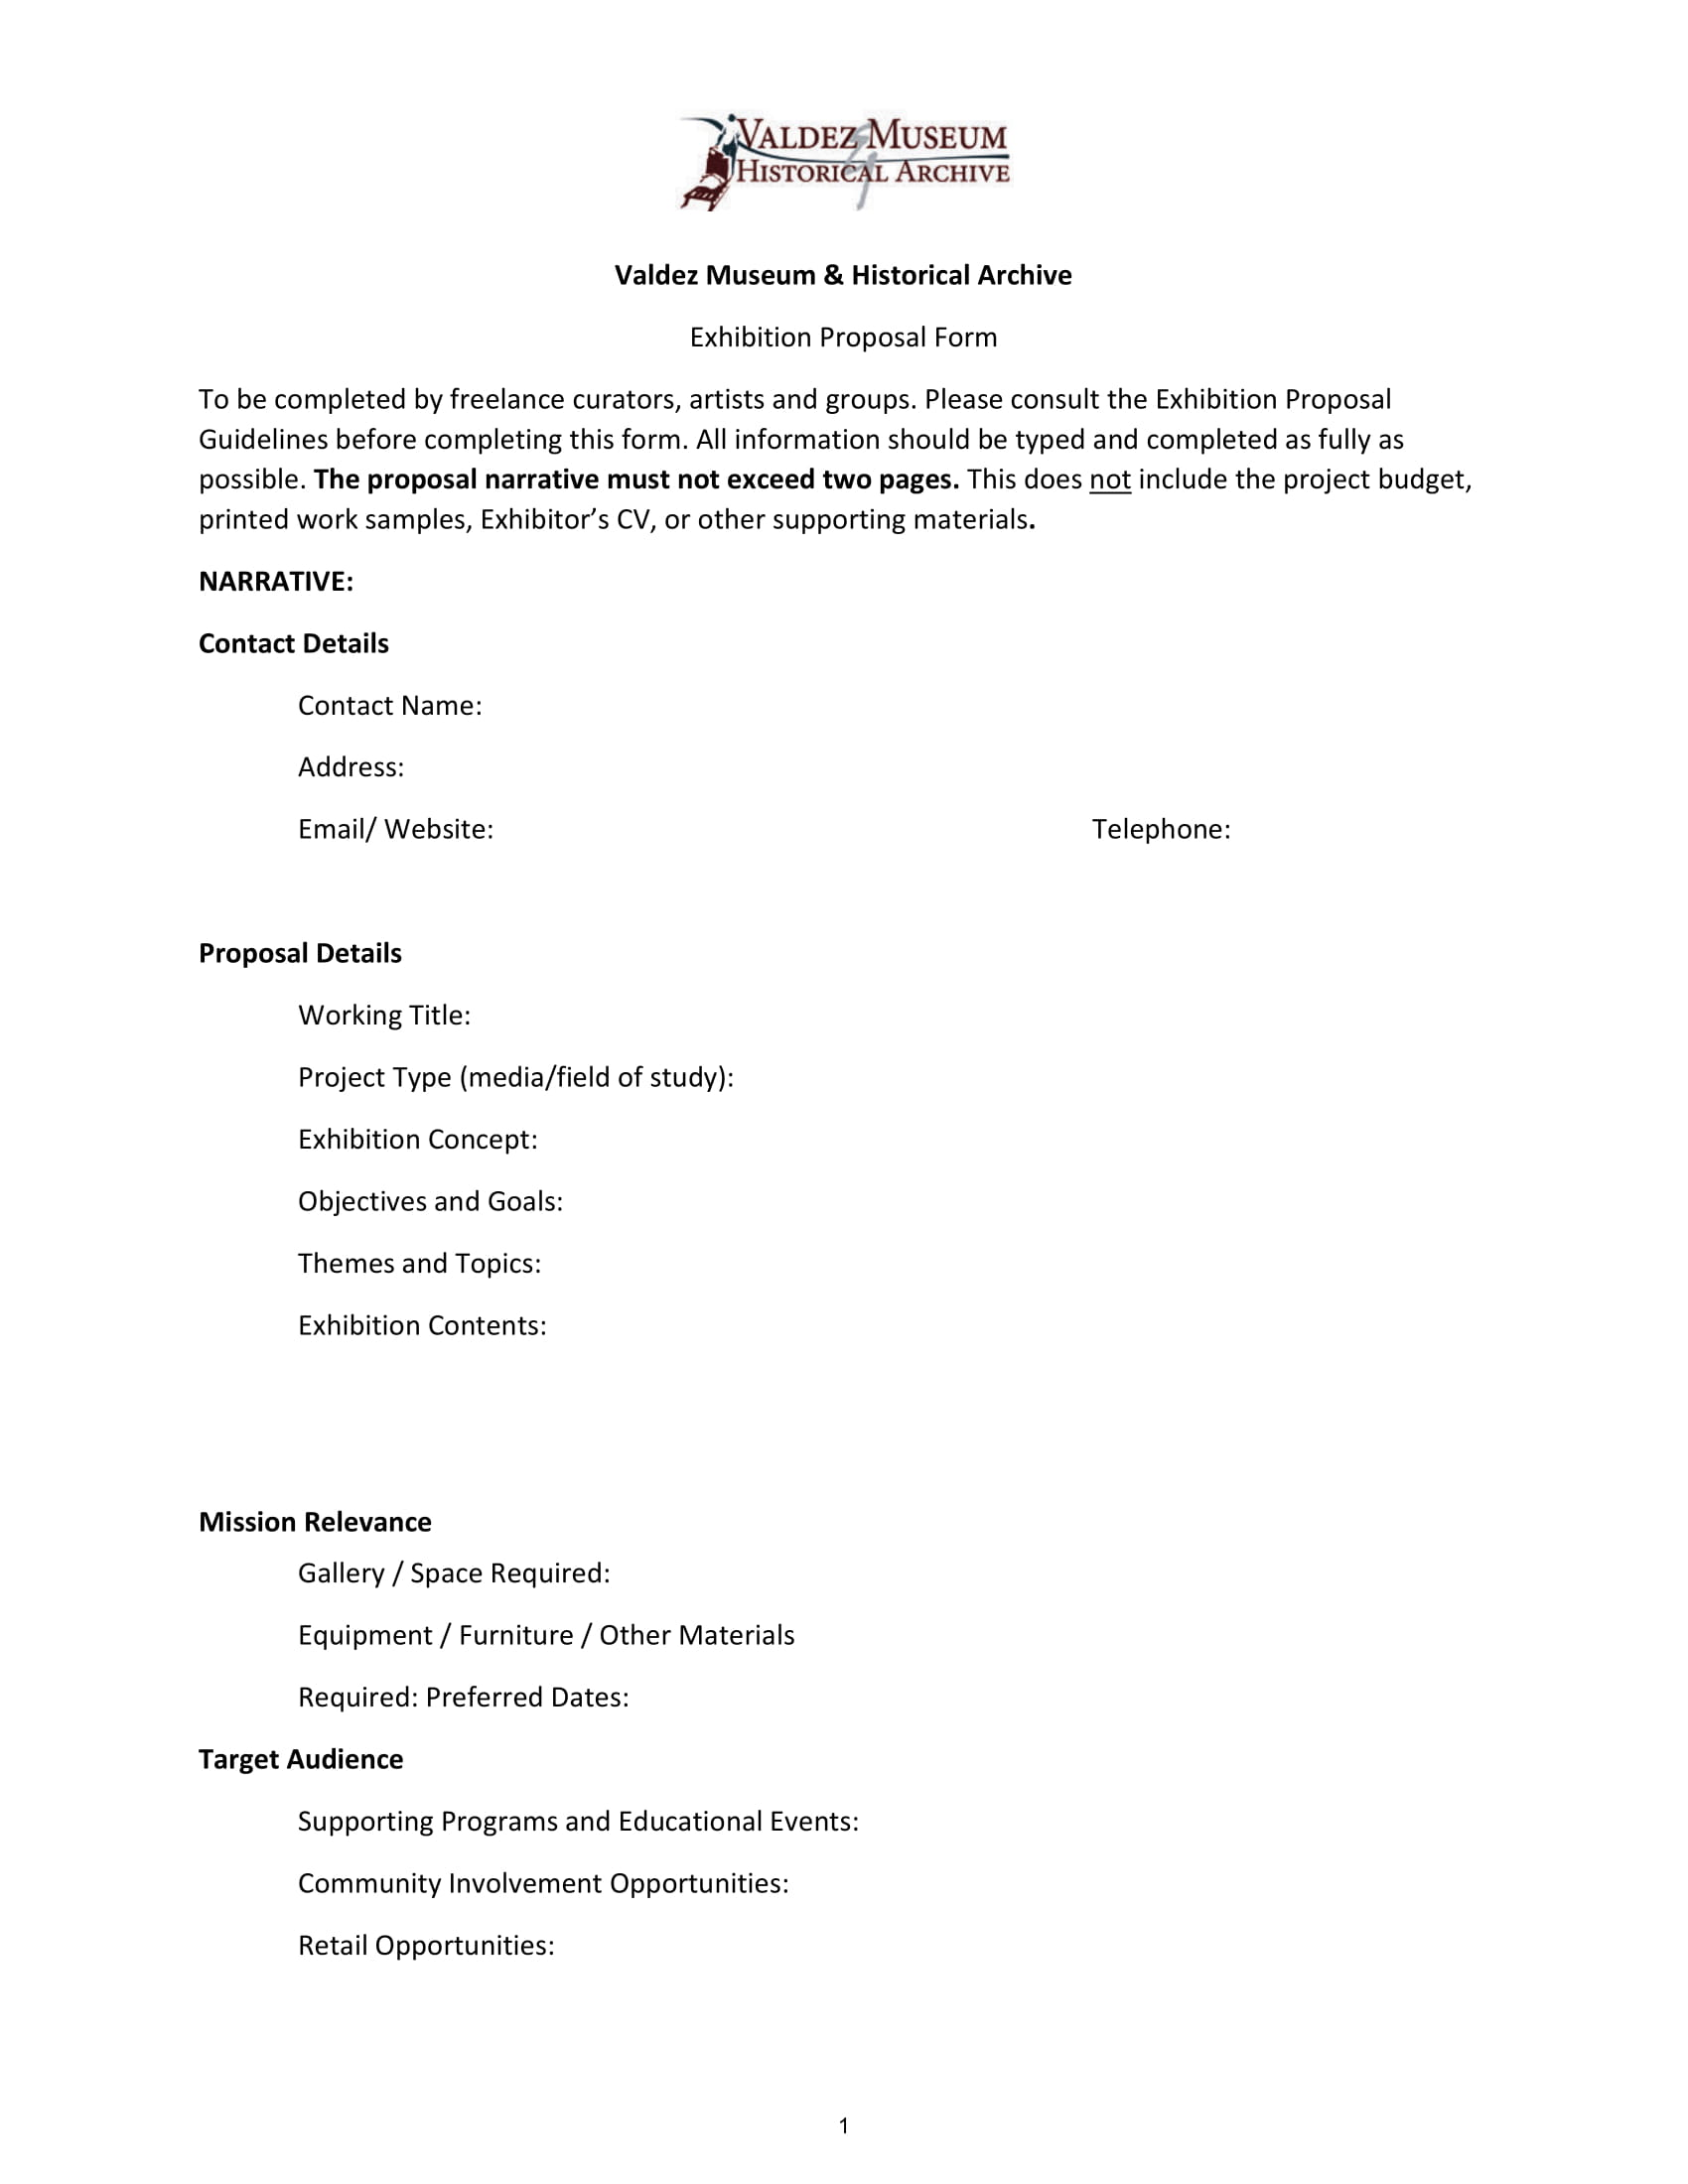 vmh exhibit proposal form